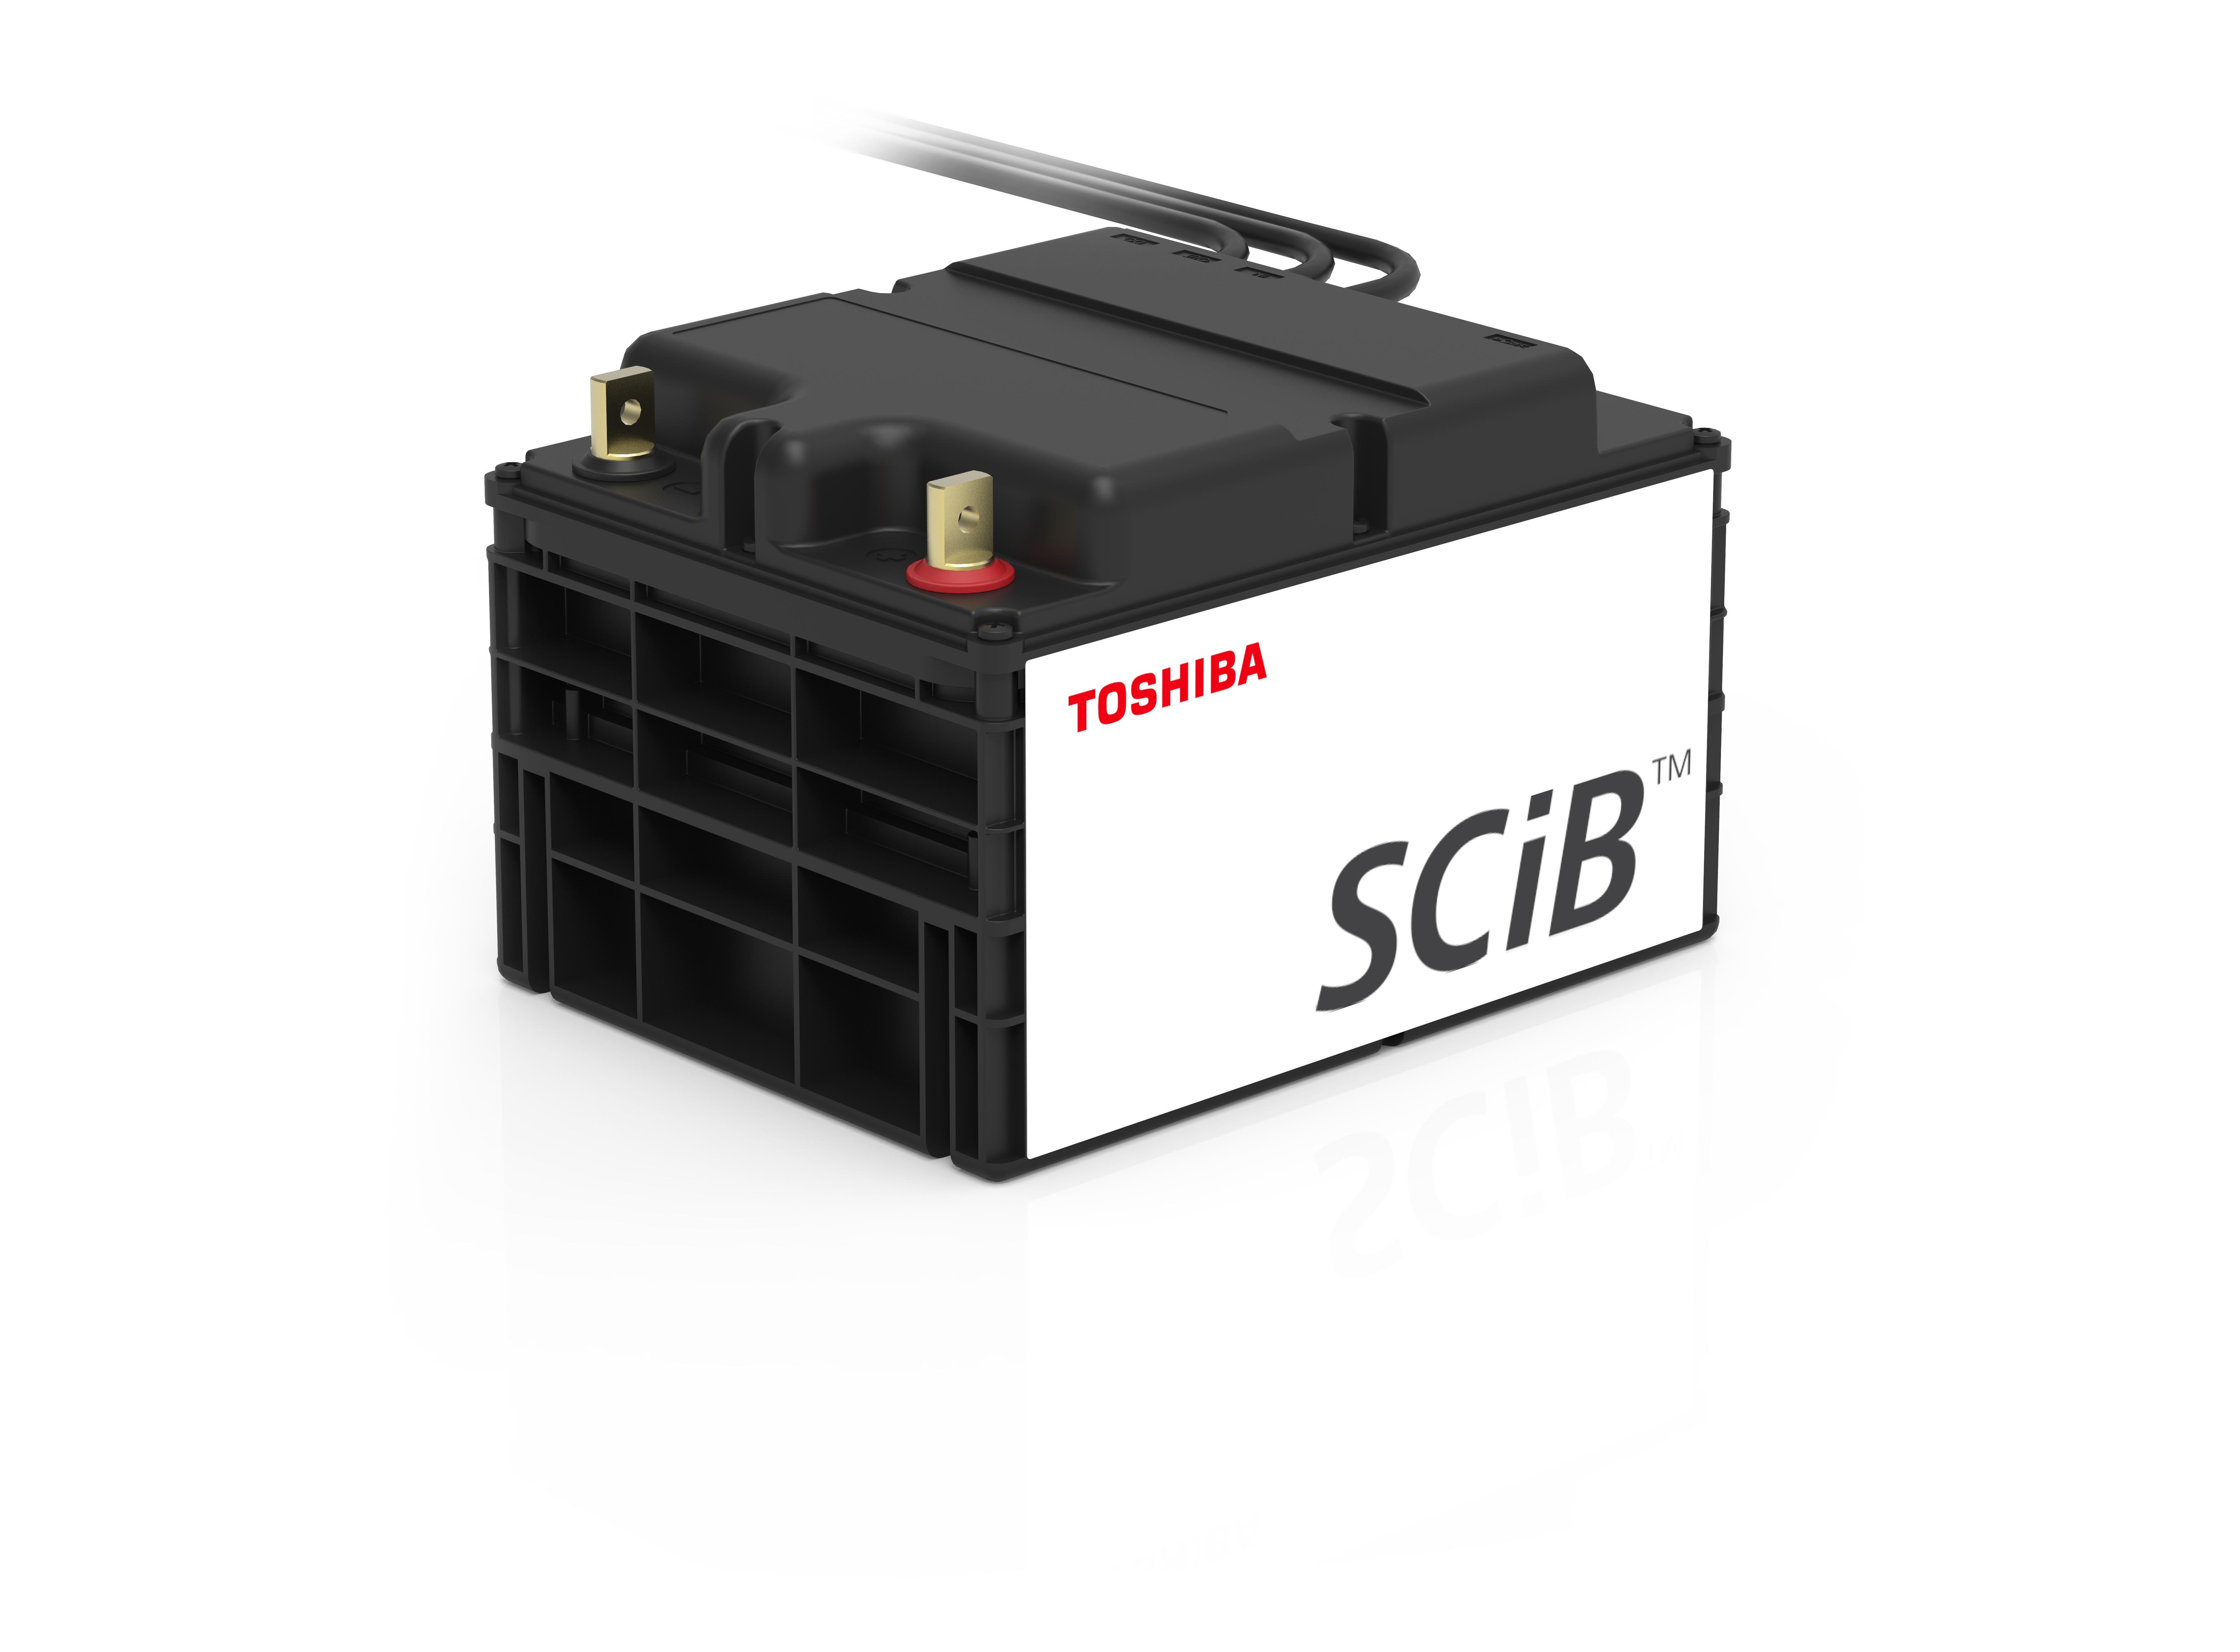 Toshiba SIP series of SCiB